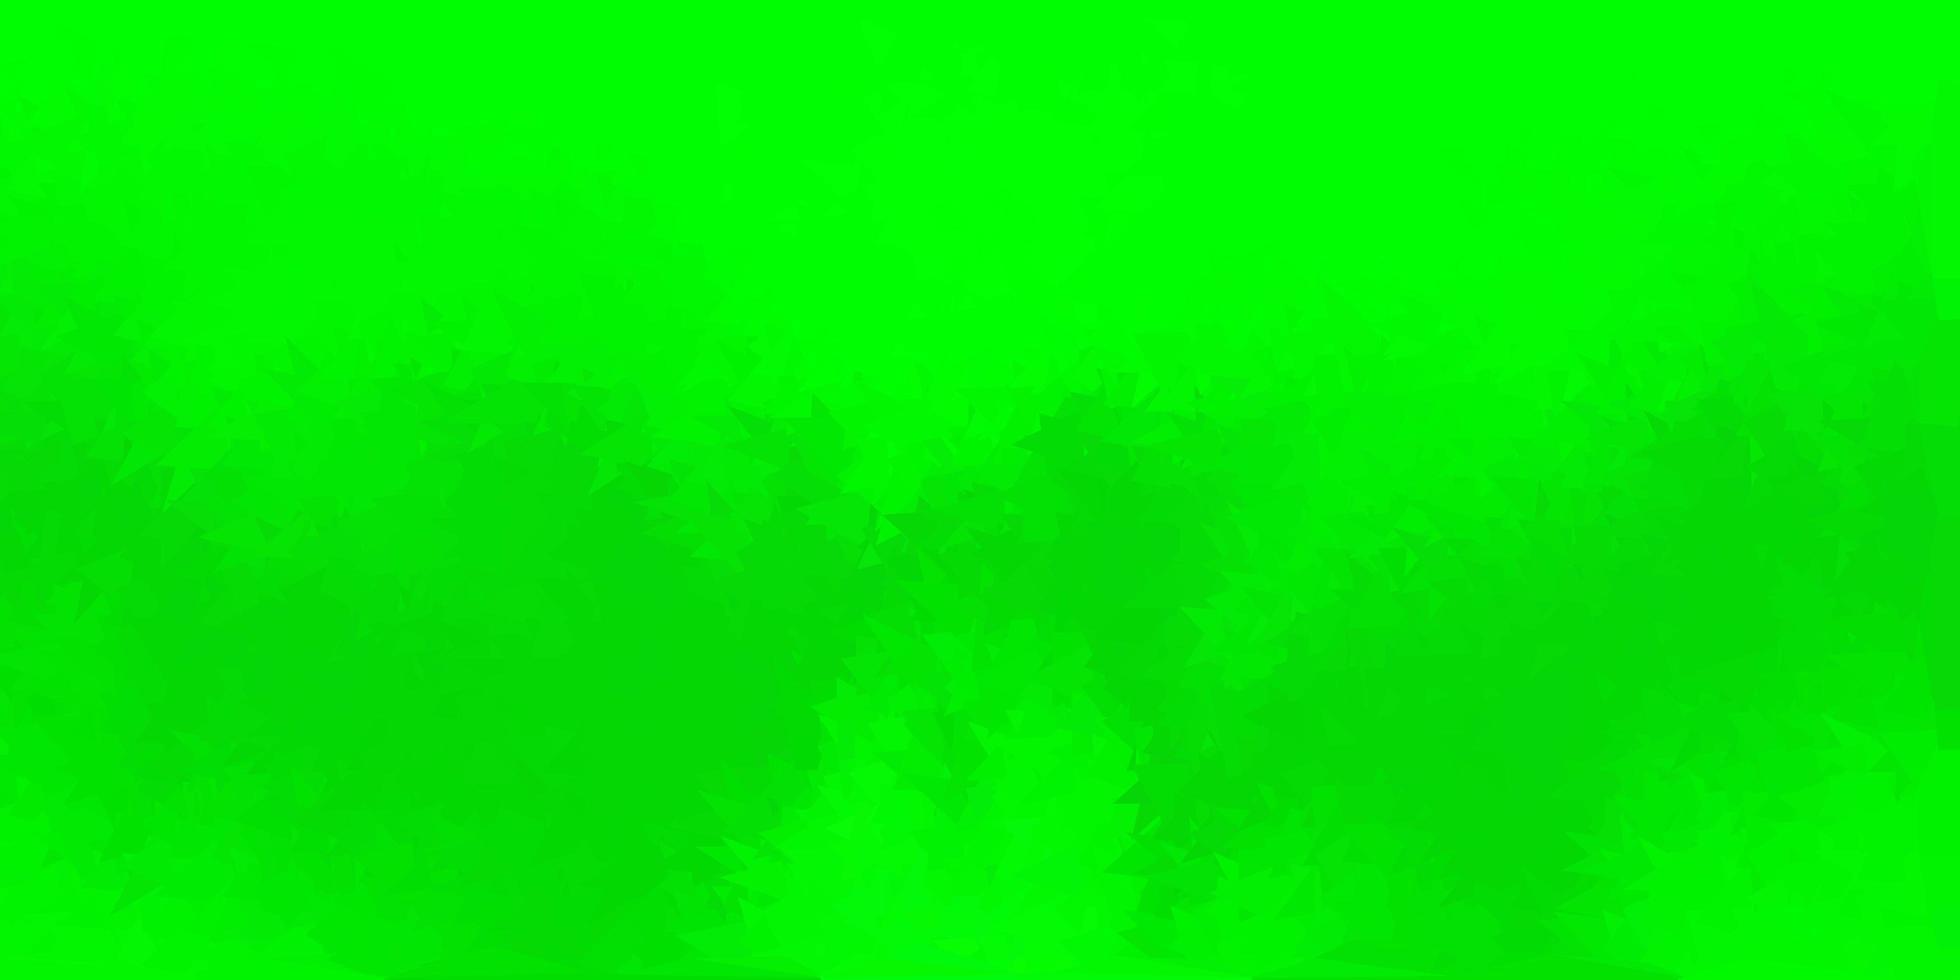 mörkgrön vektor abstrakt triangelmönster.